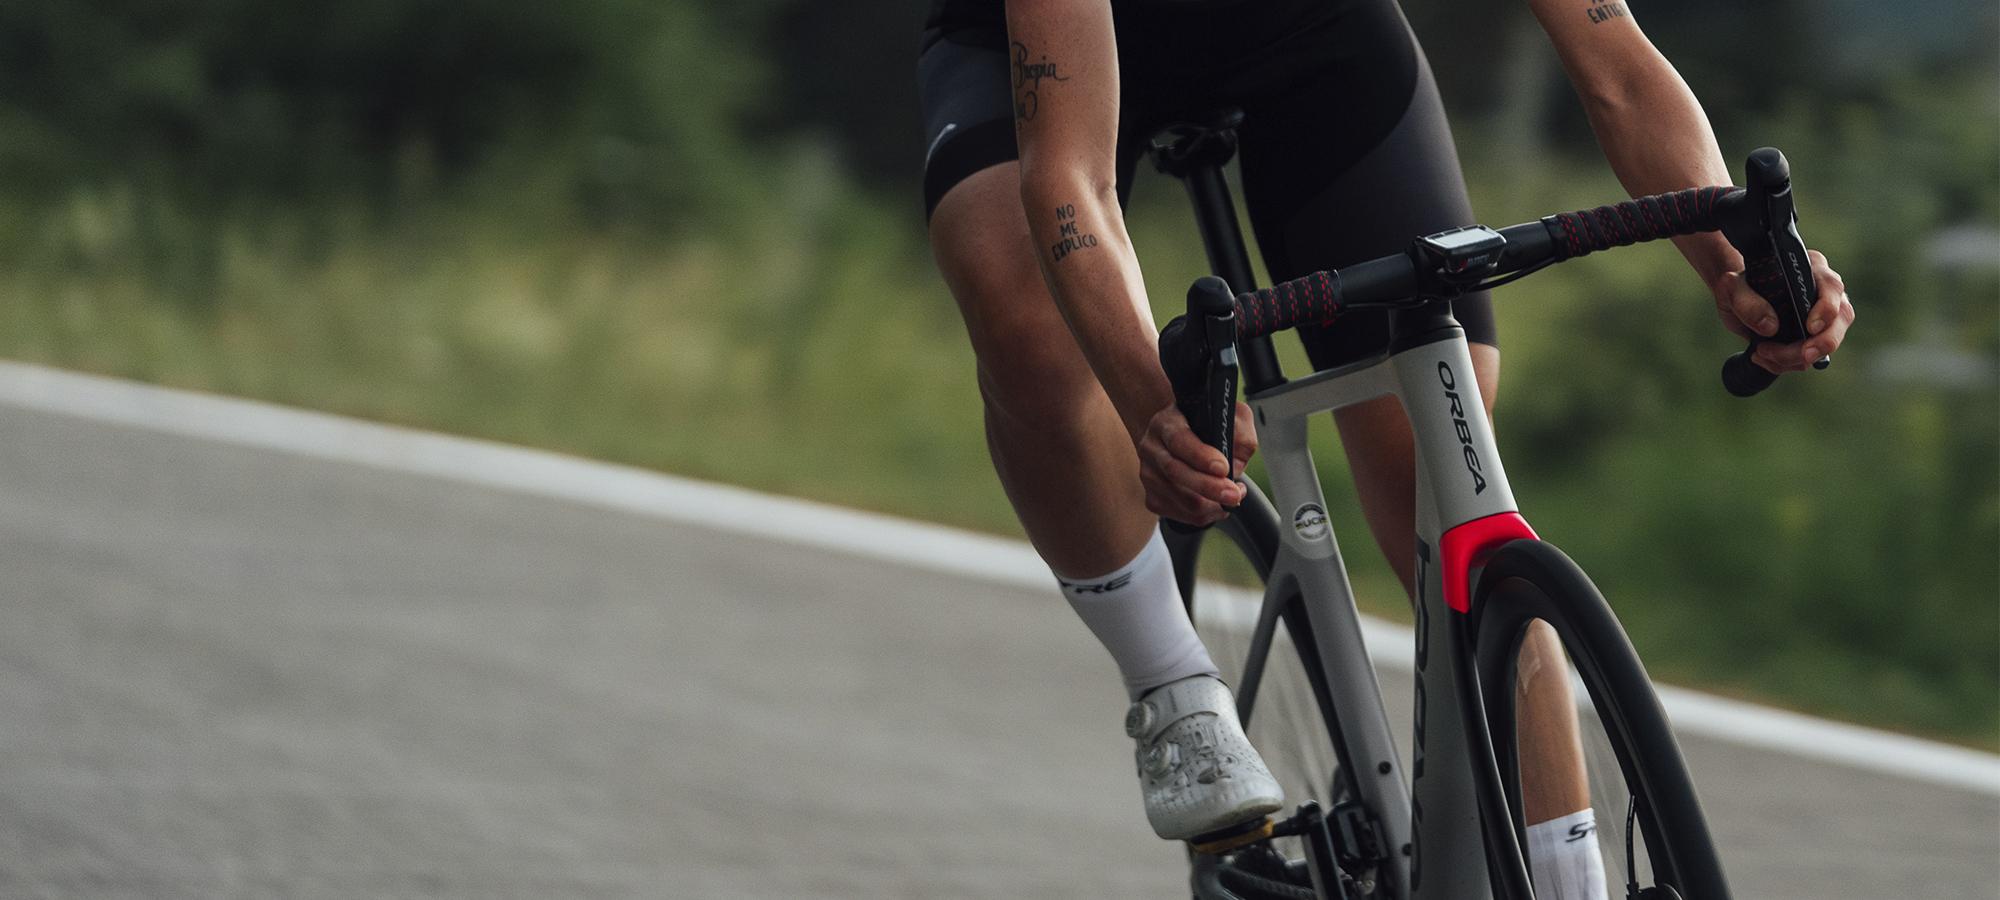 DOT_diseño_producto_OrcaOMX_Bicicleta_Carretera_Bicycles_Road_Ciclismo_Orbea_6